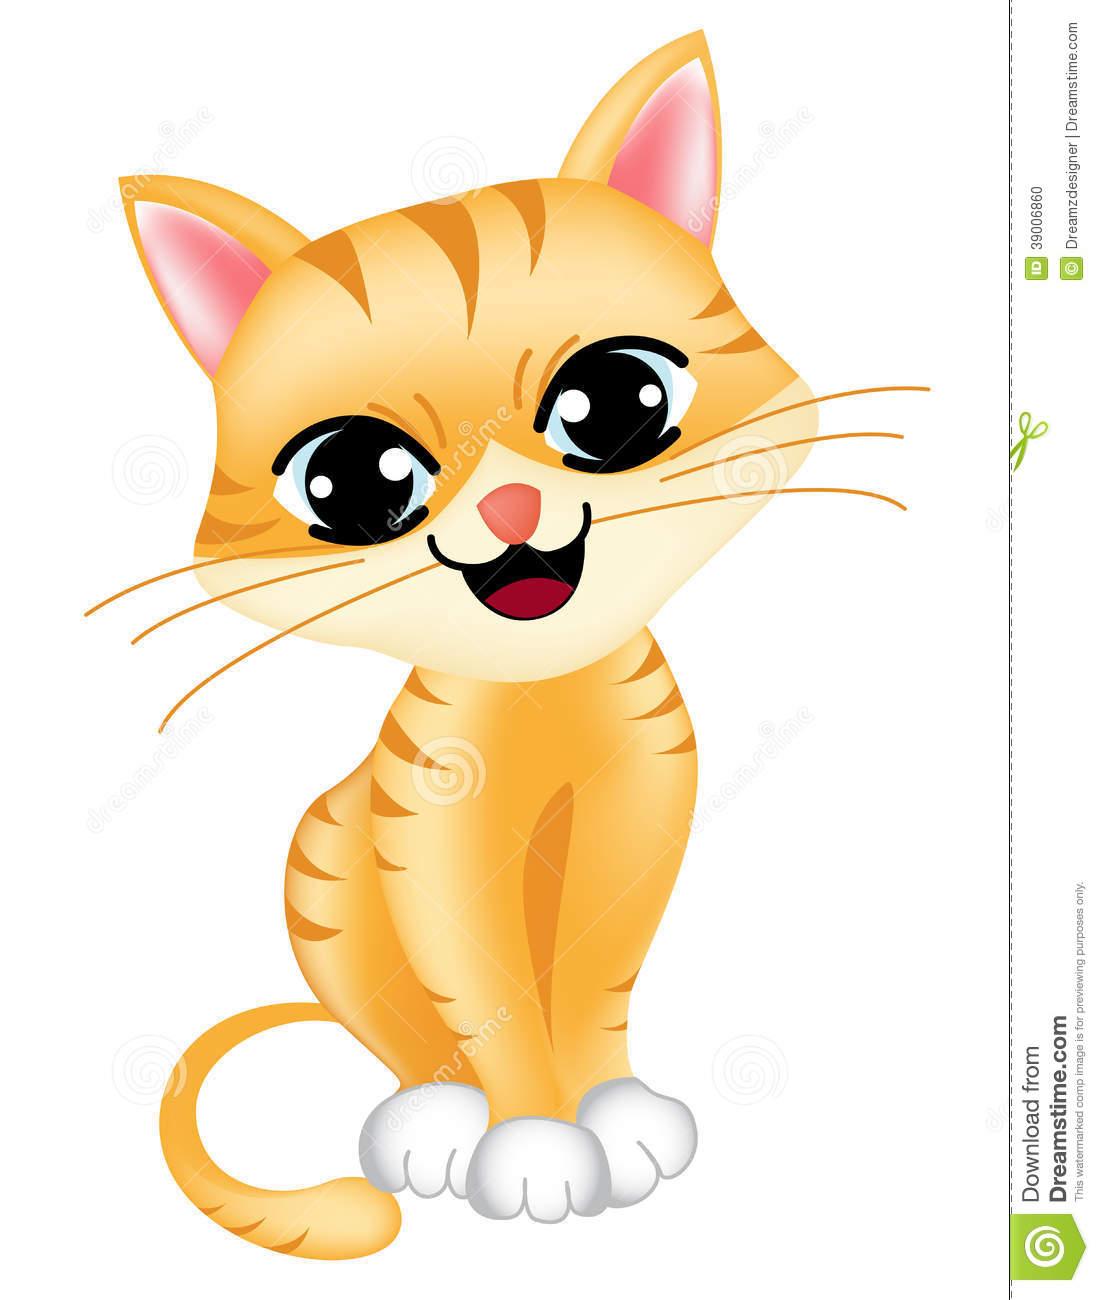 Clipart cute baby cat.